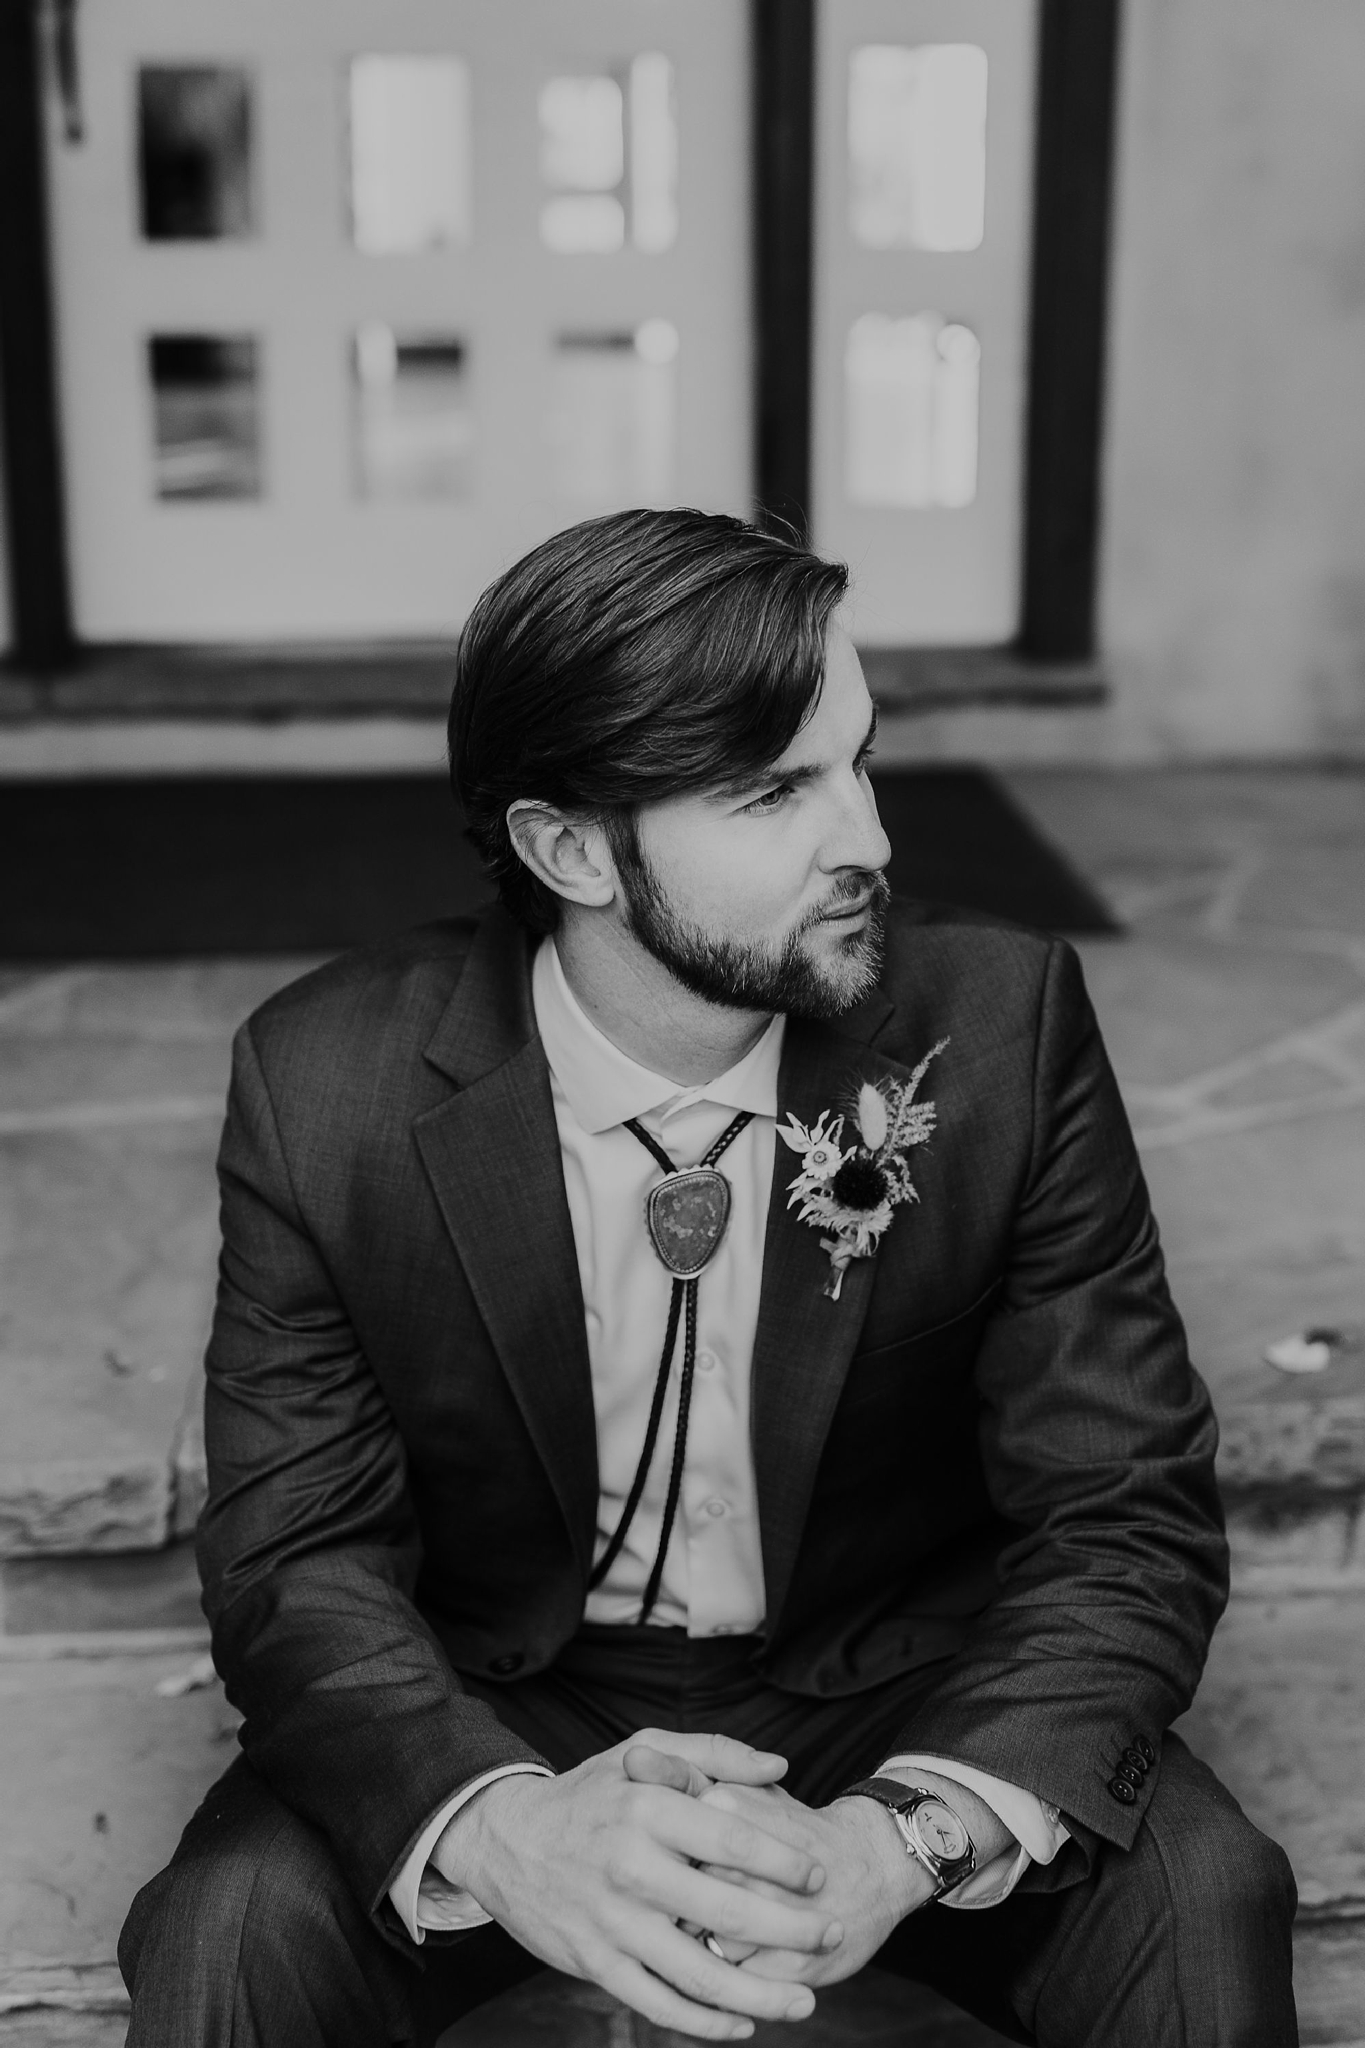 Alicia+lucia+photography+-+albuquerque+wedding+photographer+-+santa+fe+wedding+photography+-+new+mexico+wedding+photographer+-+new+mexico+wedding+-+wedding+-+groom+-+groom+style+-+wedding+style_0012.jpg